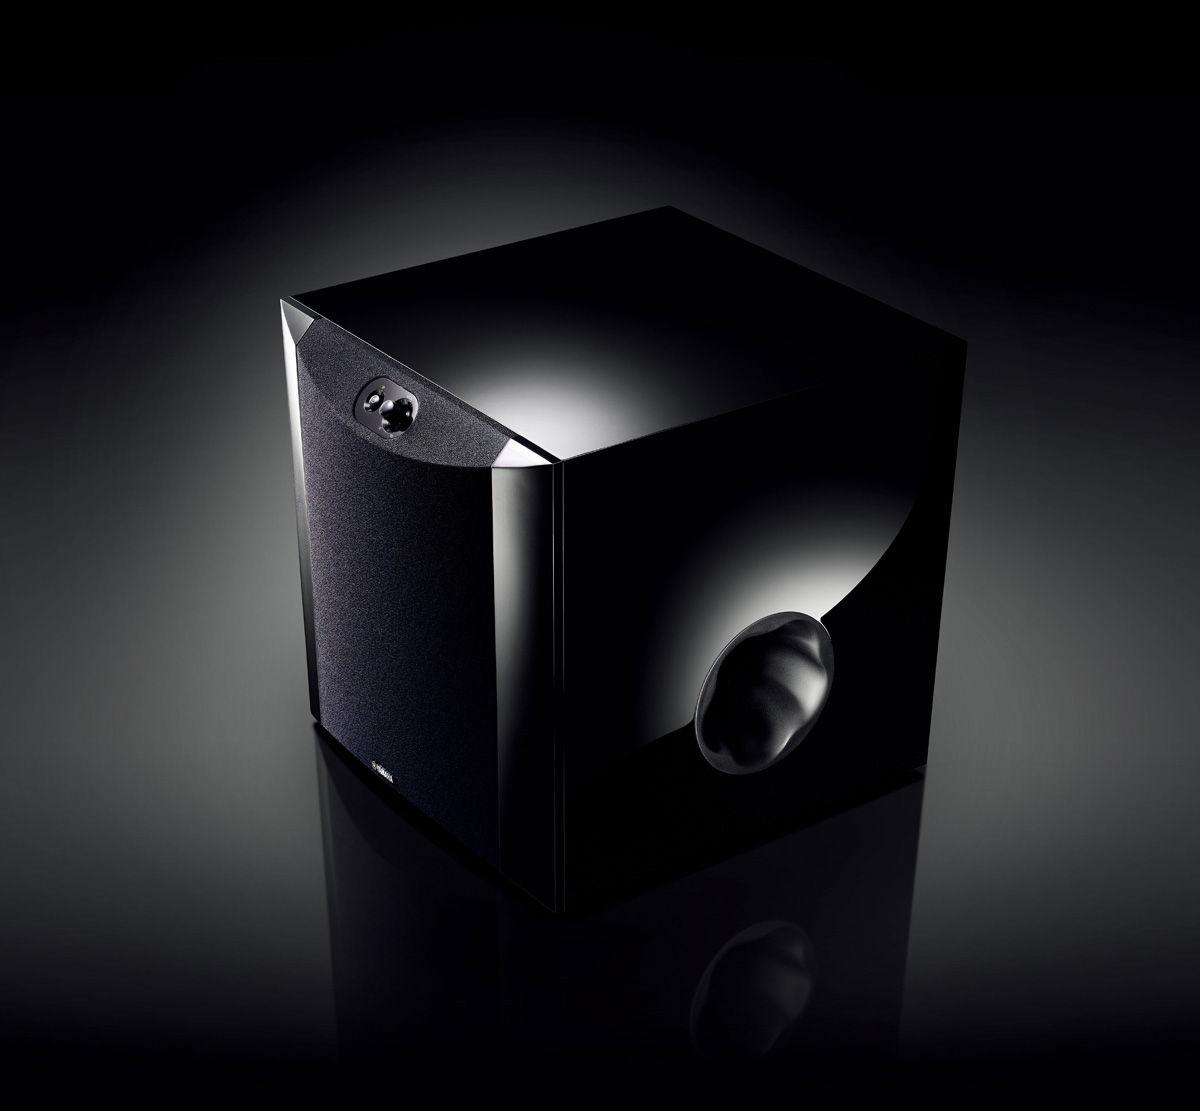 yamaha ns sw200 caissons de basses son vid. Black Bedroom Furniture Sets. Home Design Ideas